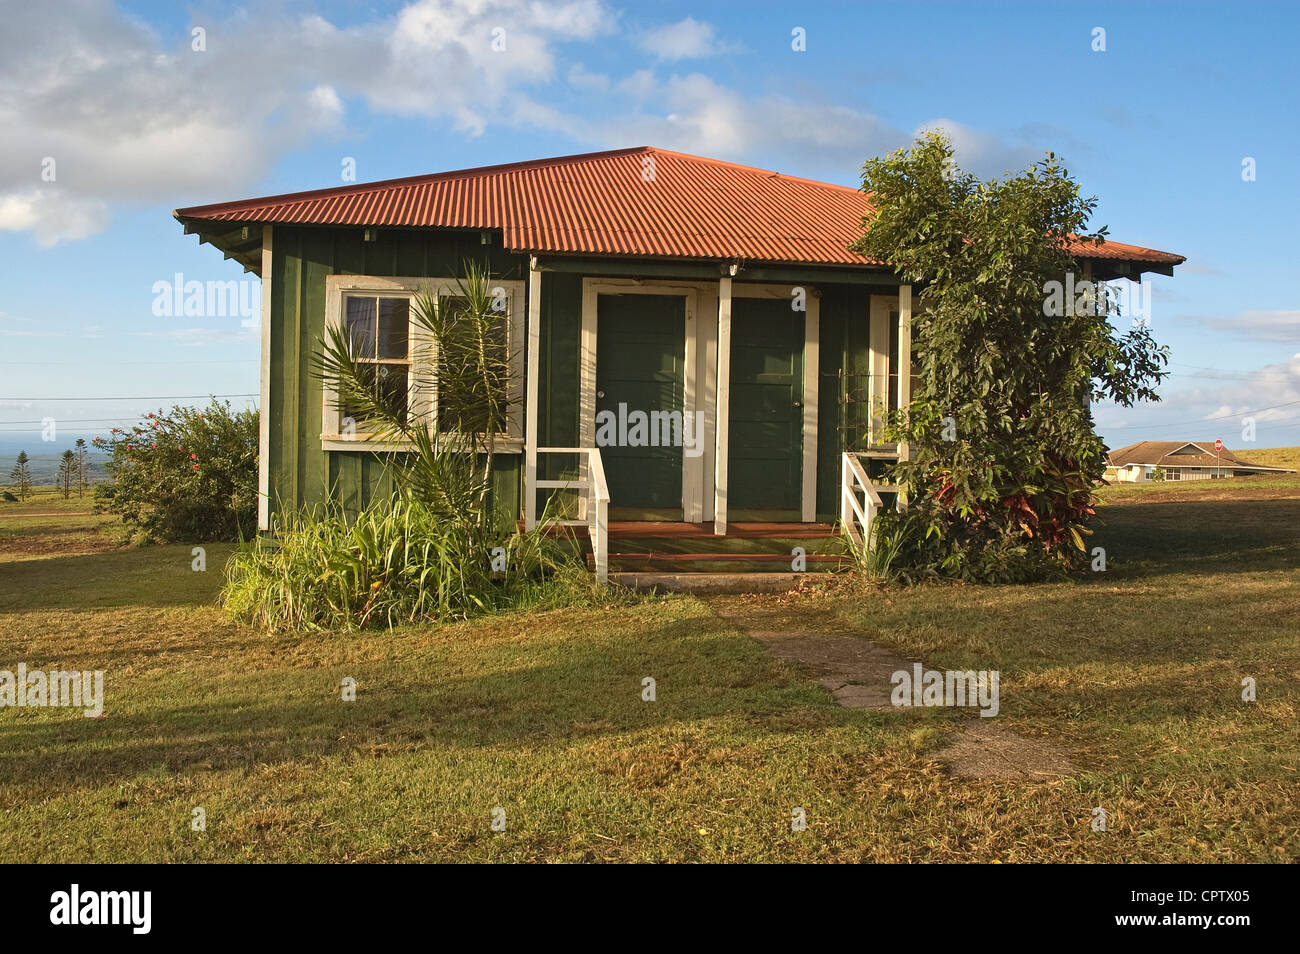 Hawaii, Molokai, West Molokai, Maunaloa, house - Stock Image